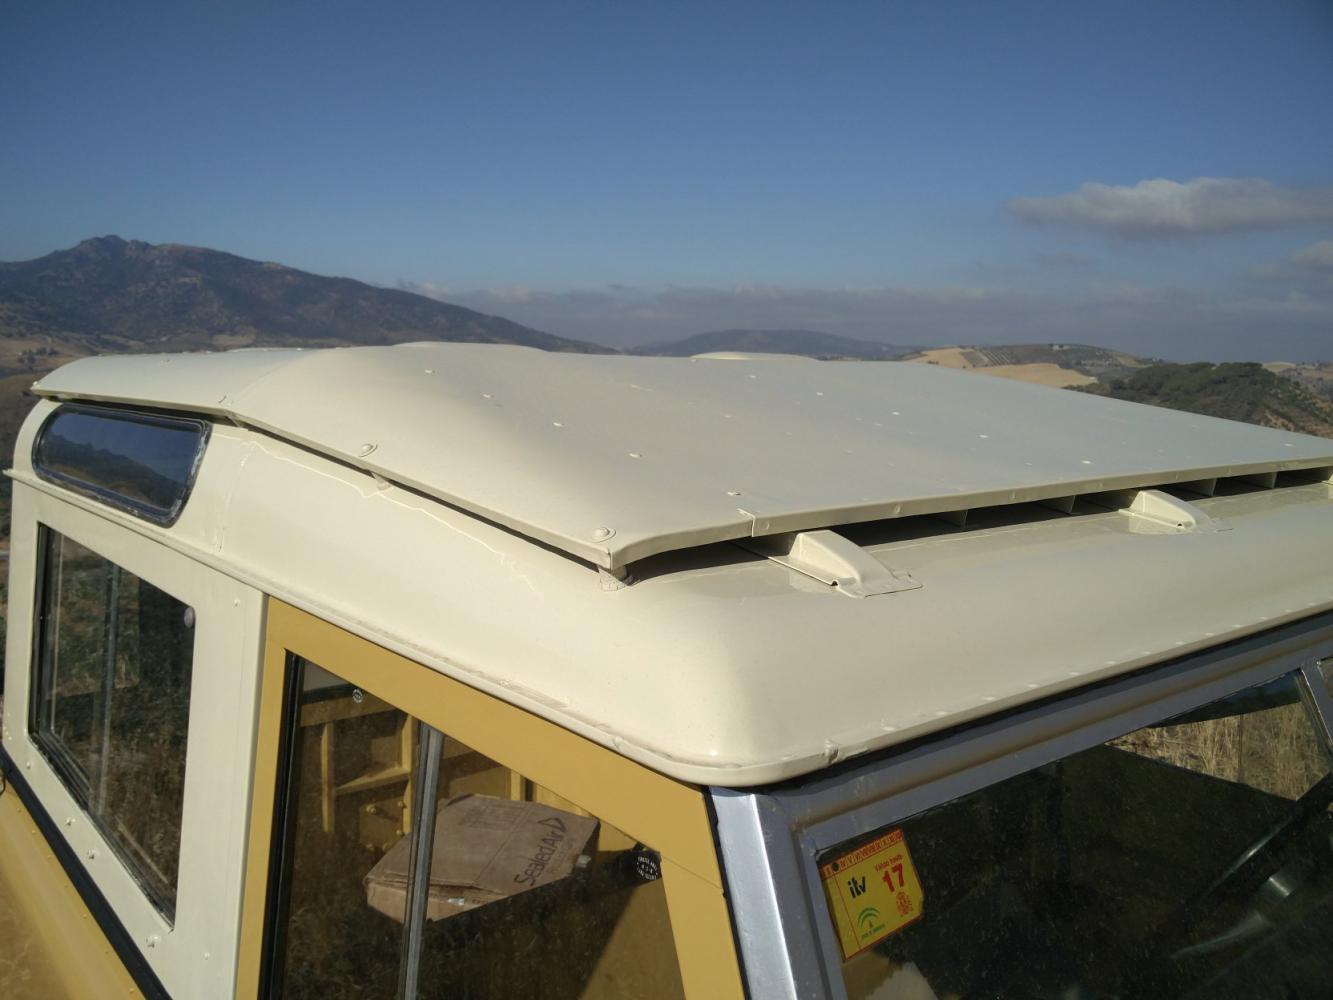 Click image for larger version  Name:1978 LR LHD Santana 88 Hardtop Mustard Yellow safari roof outside.jpg Views:137 Size:95.2 KB ID:289961